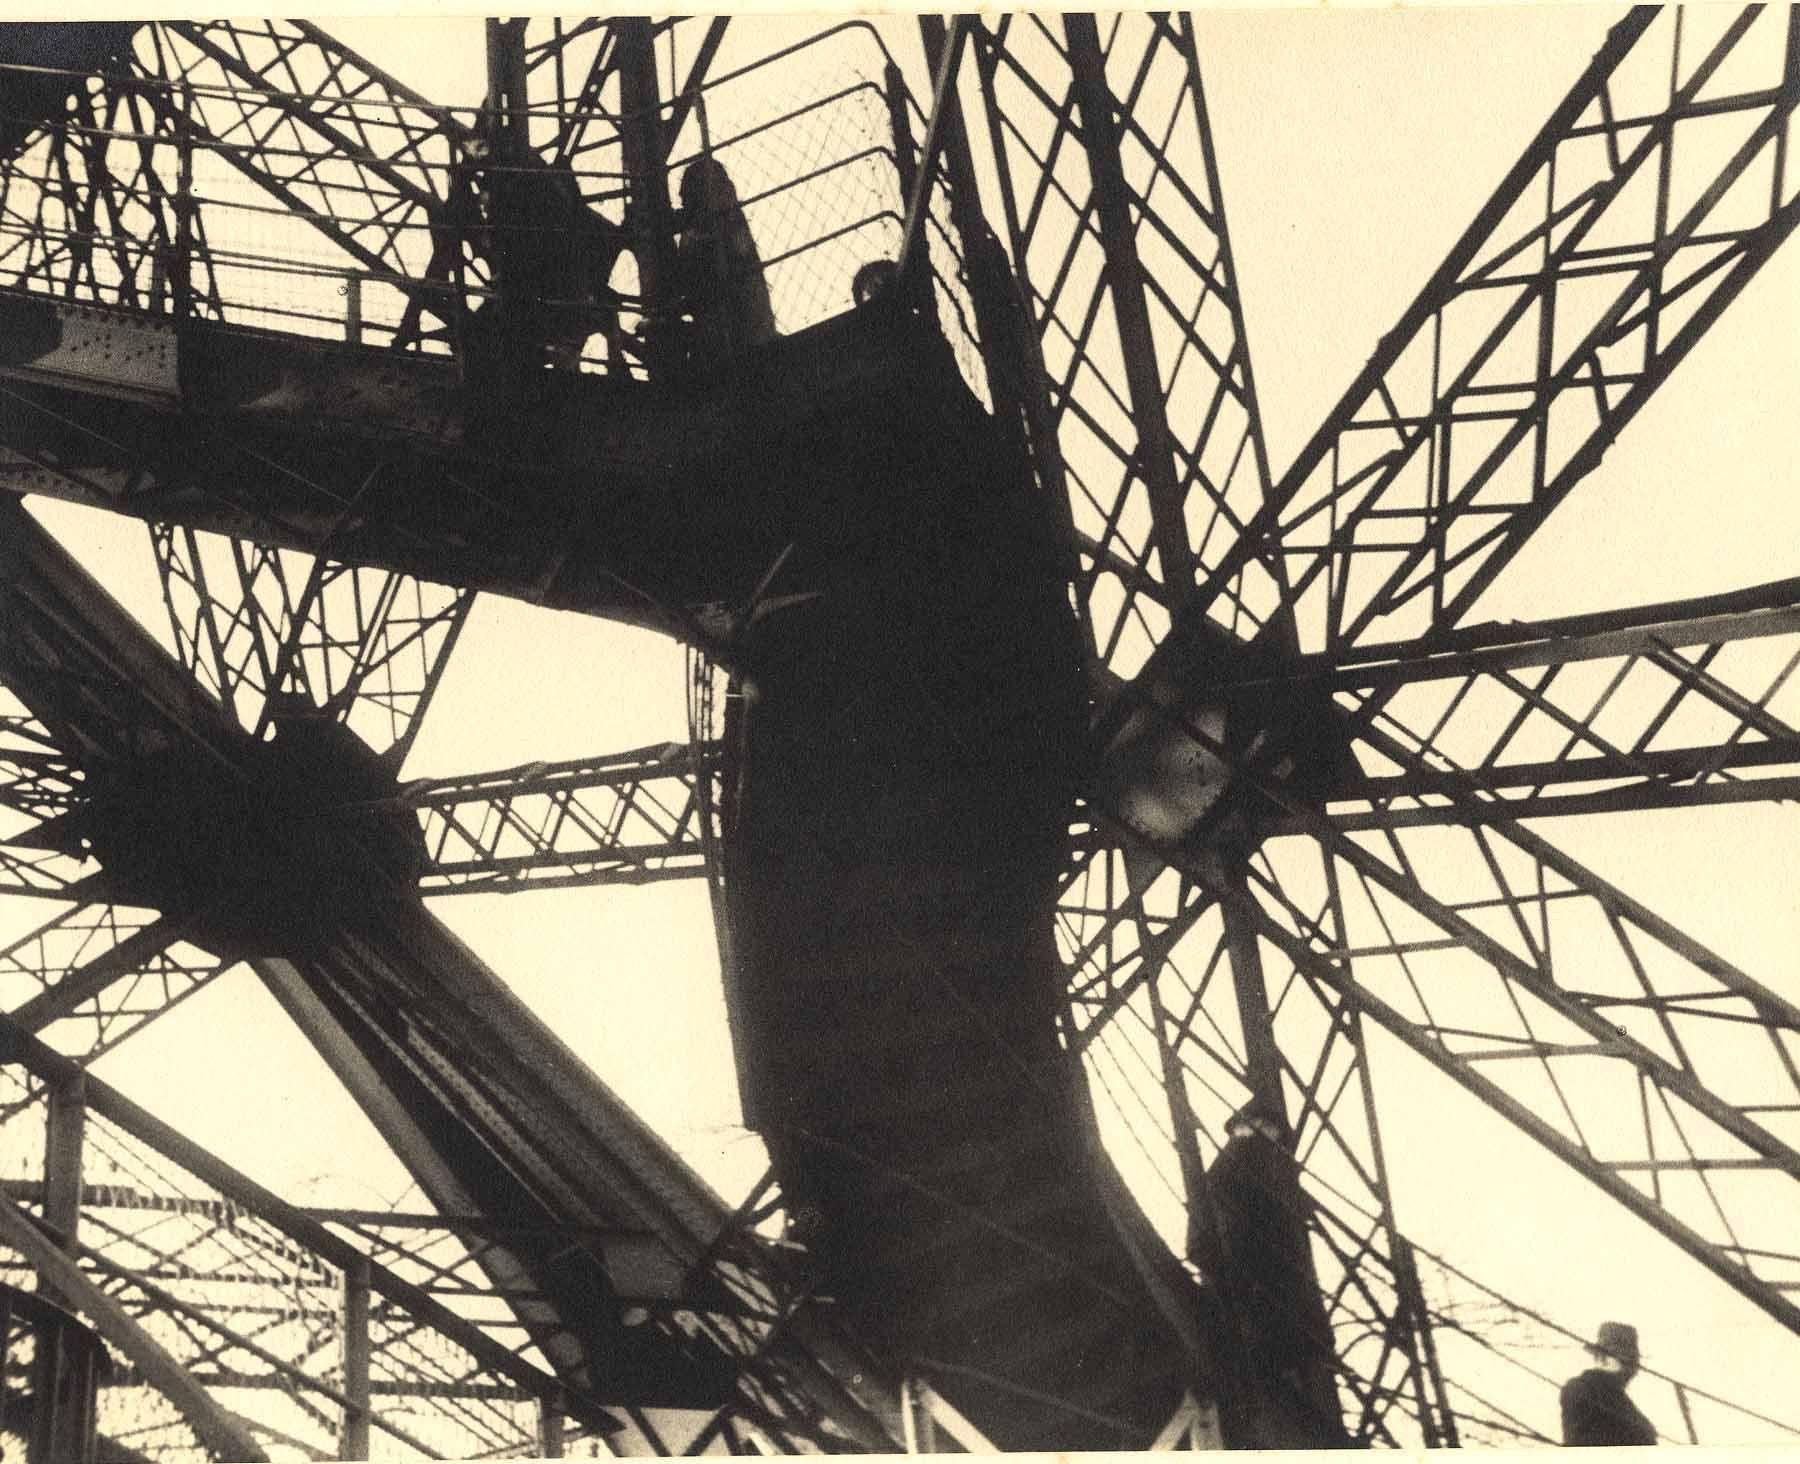 Ilse Bing, Eiffel Tower, Paris, 1932